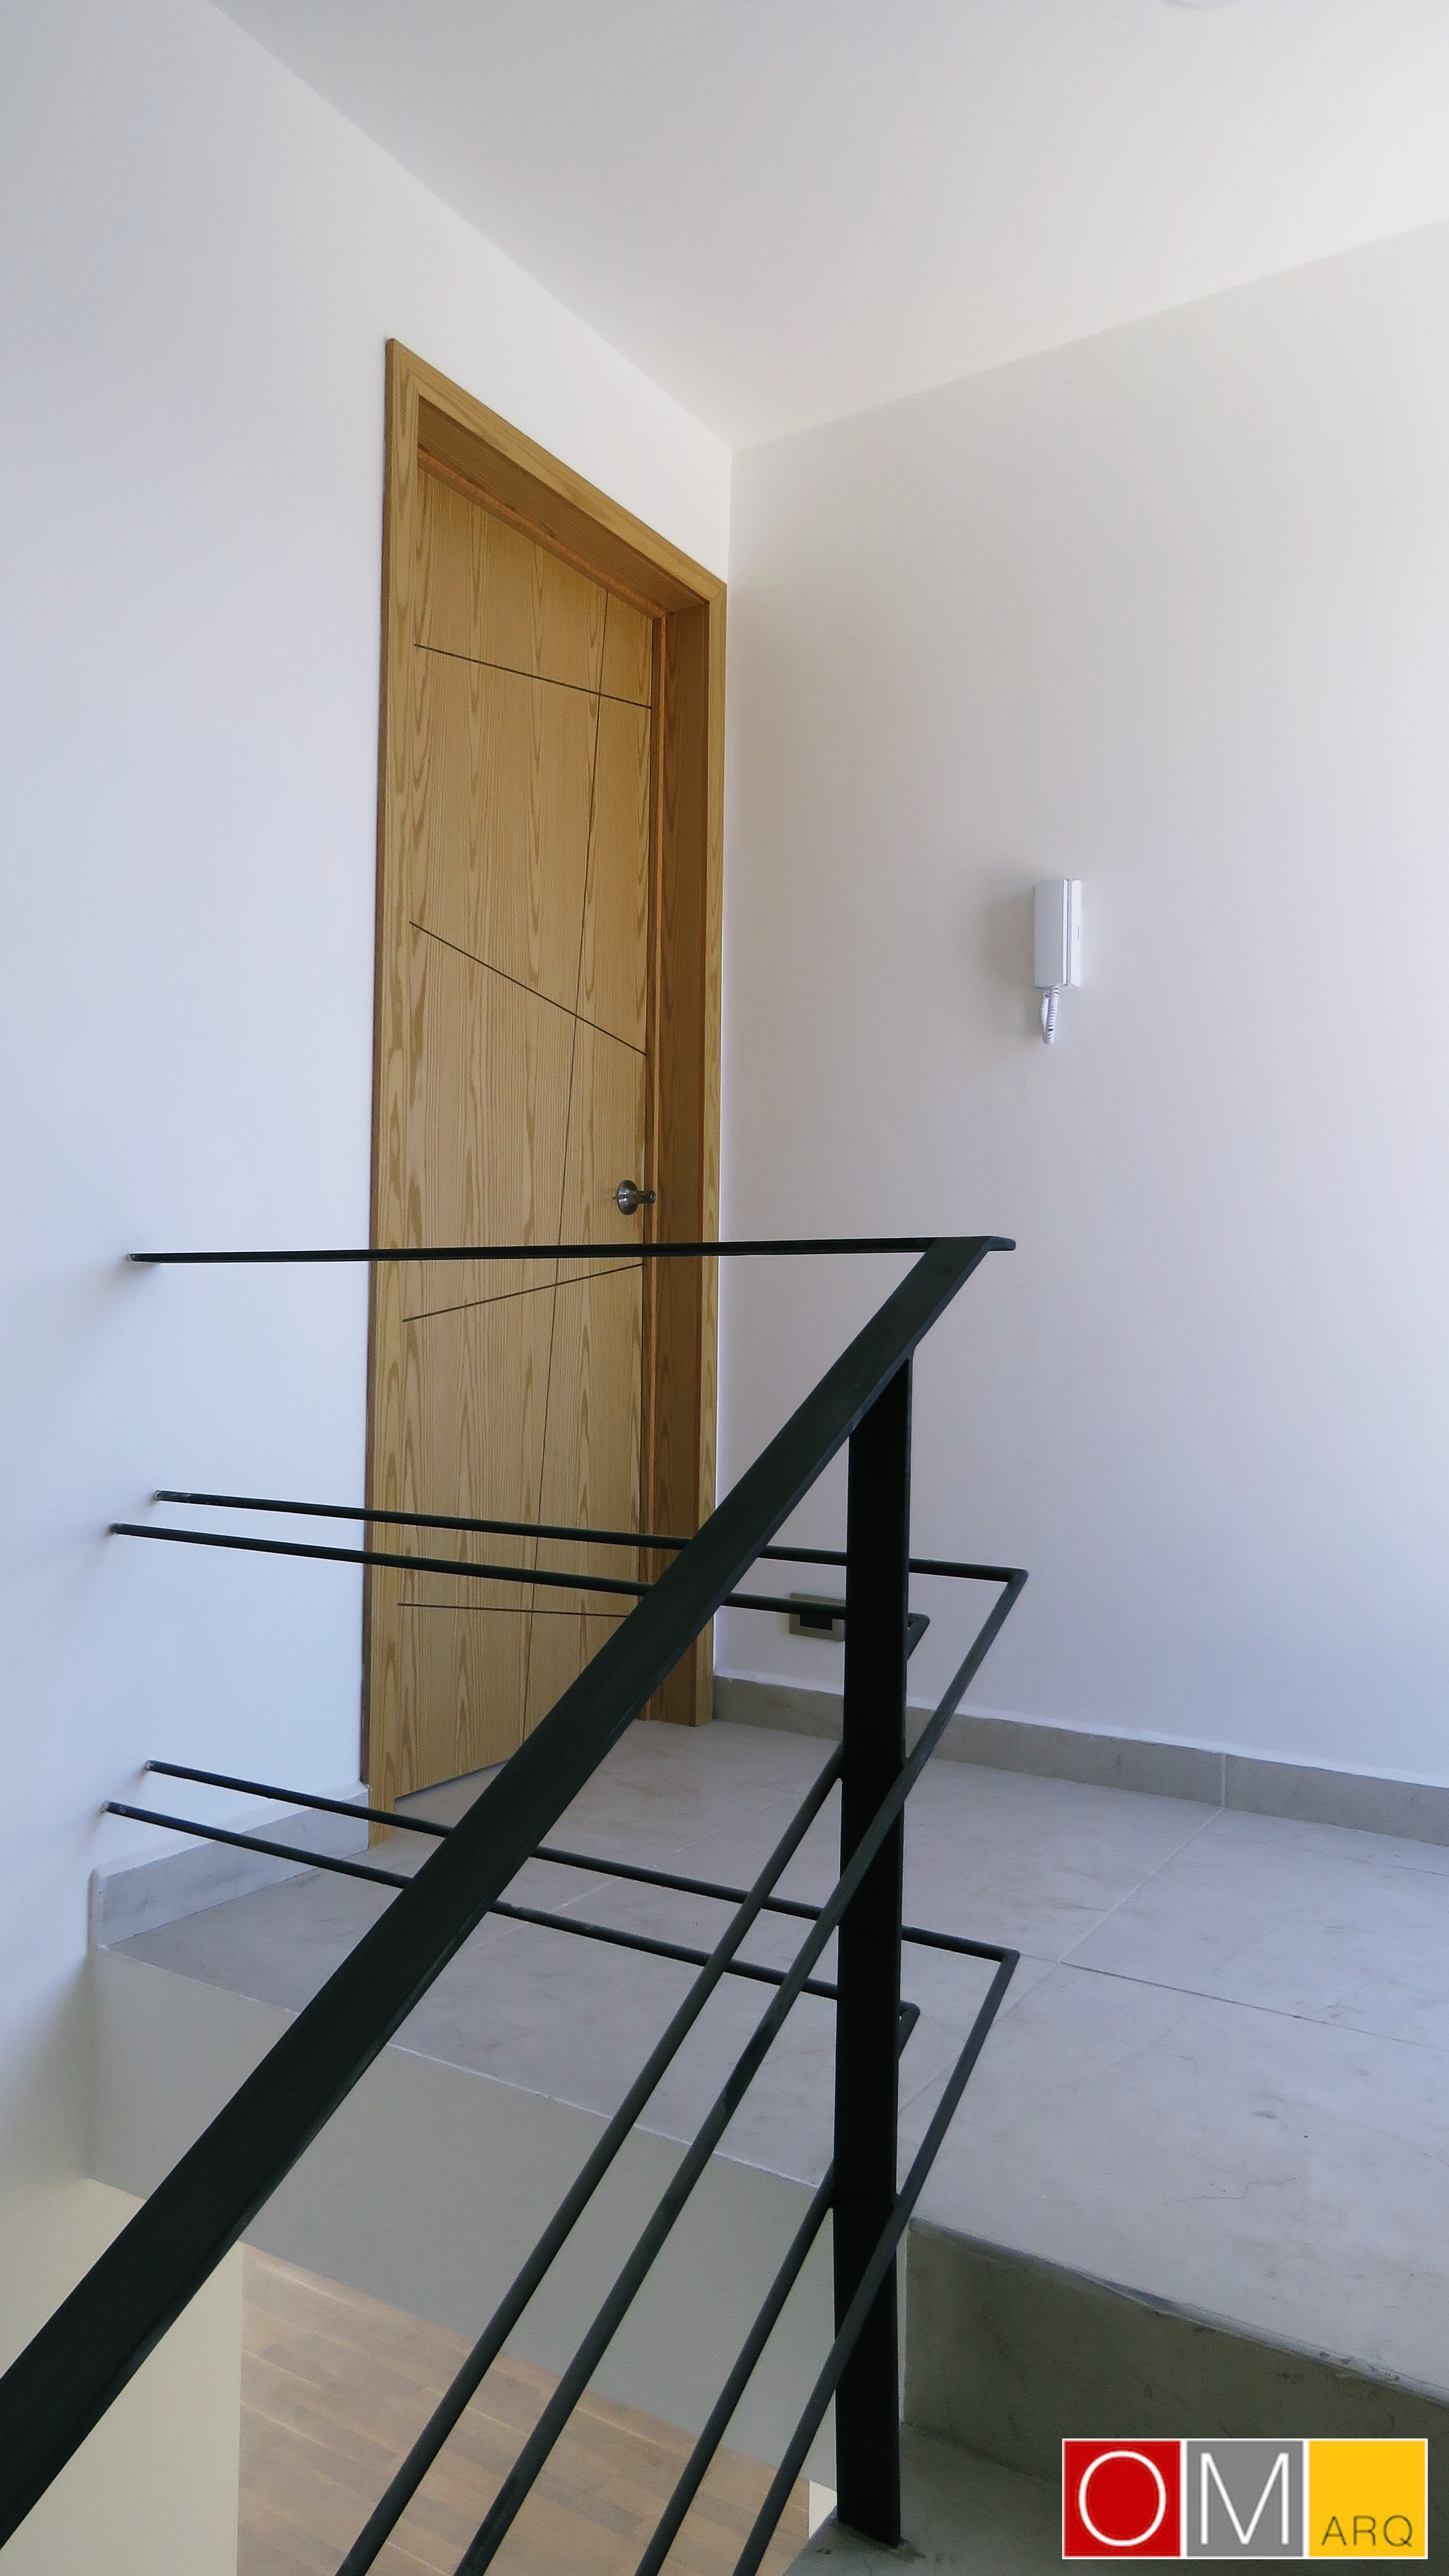 017 Escalera